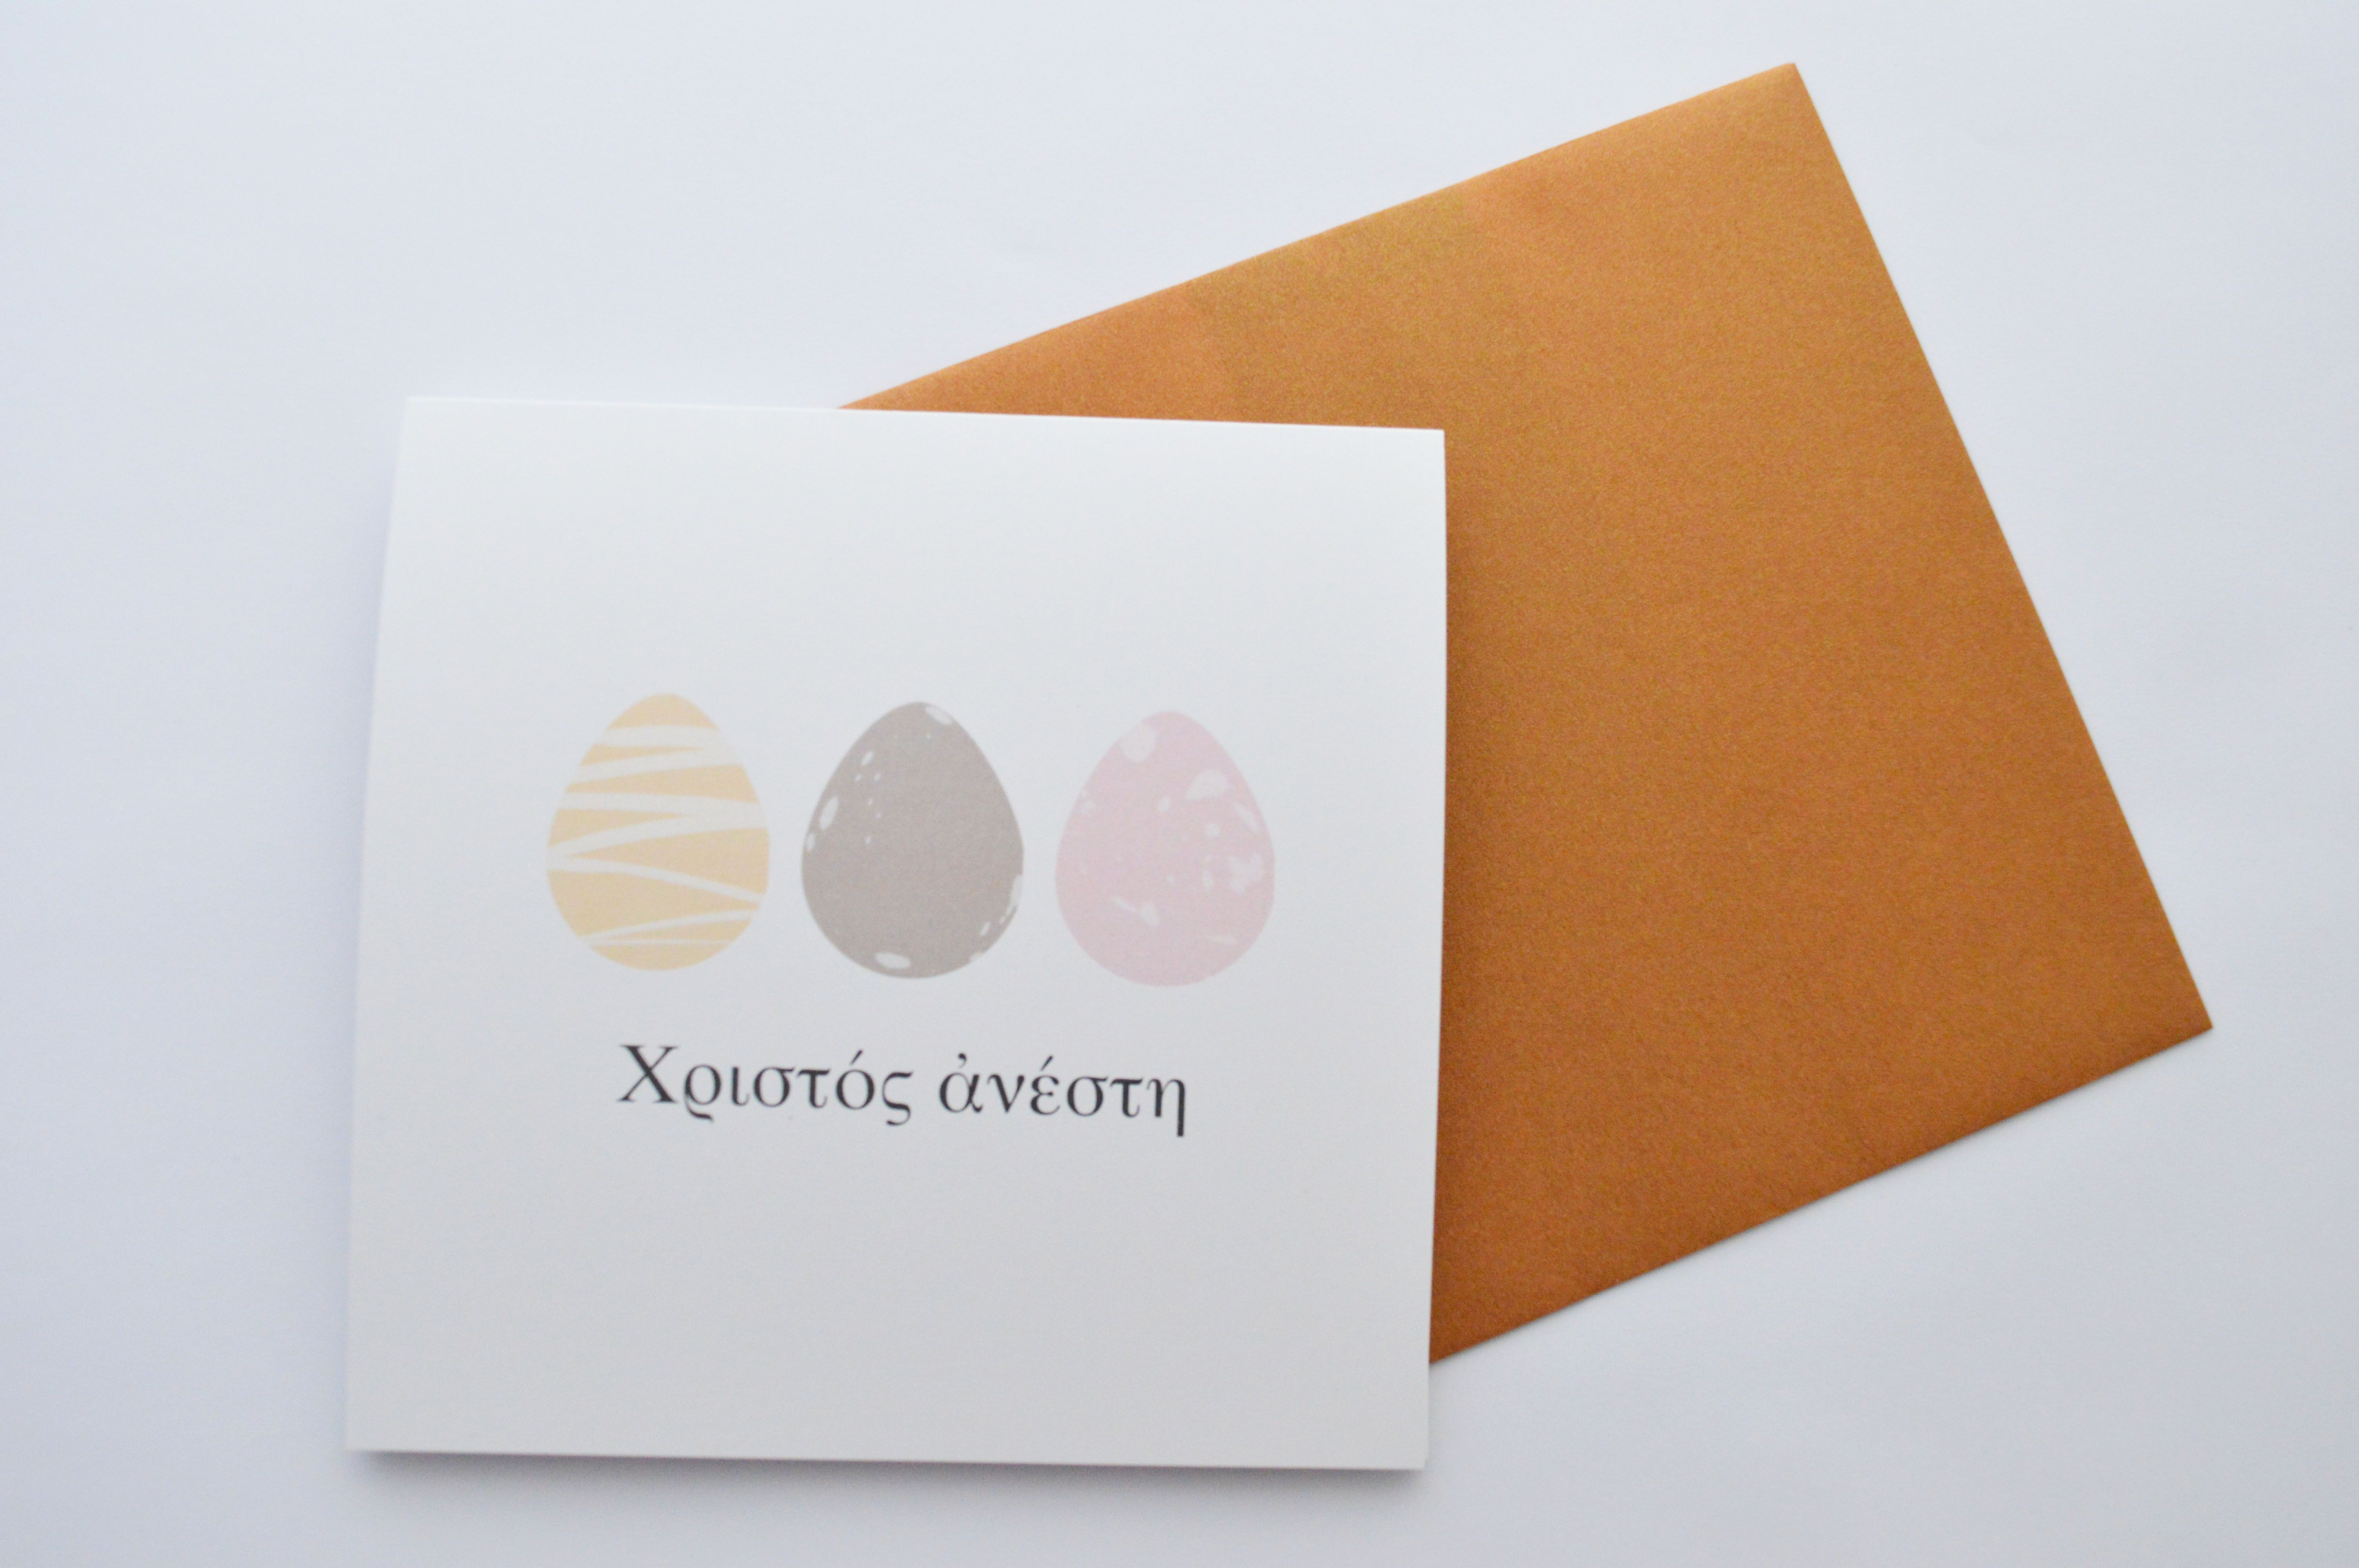 Christos Anesti Happy Orthodox Easter Greeting Cards Pinterest